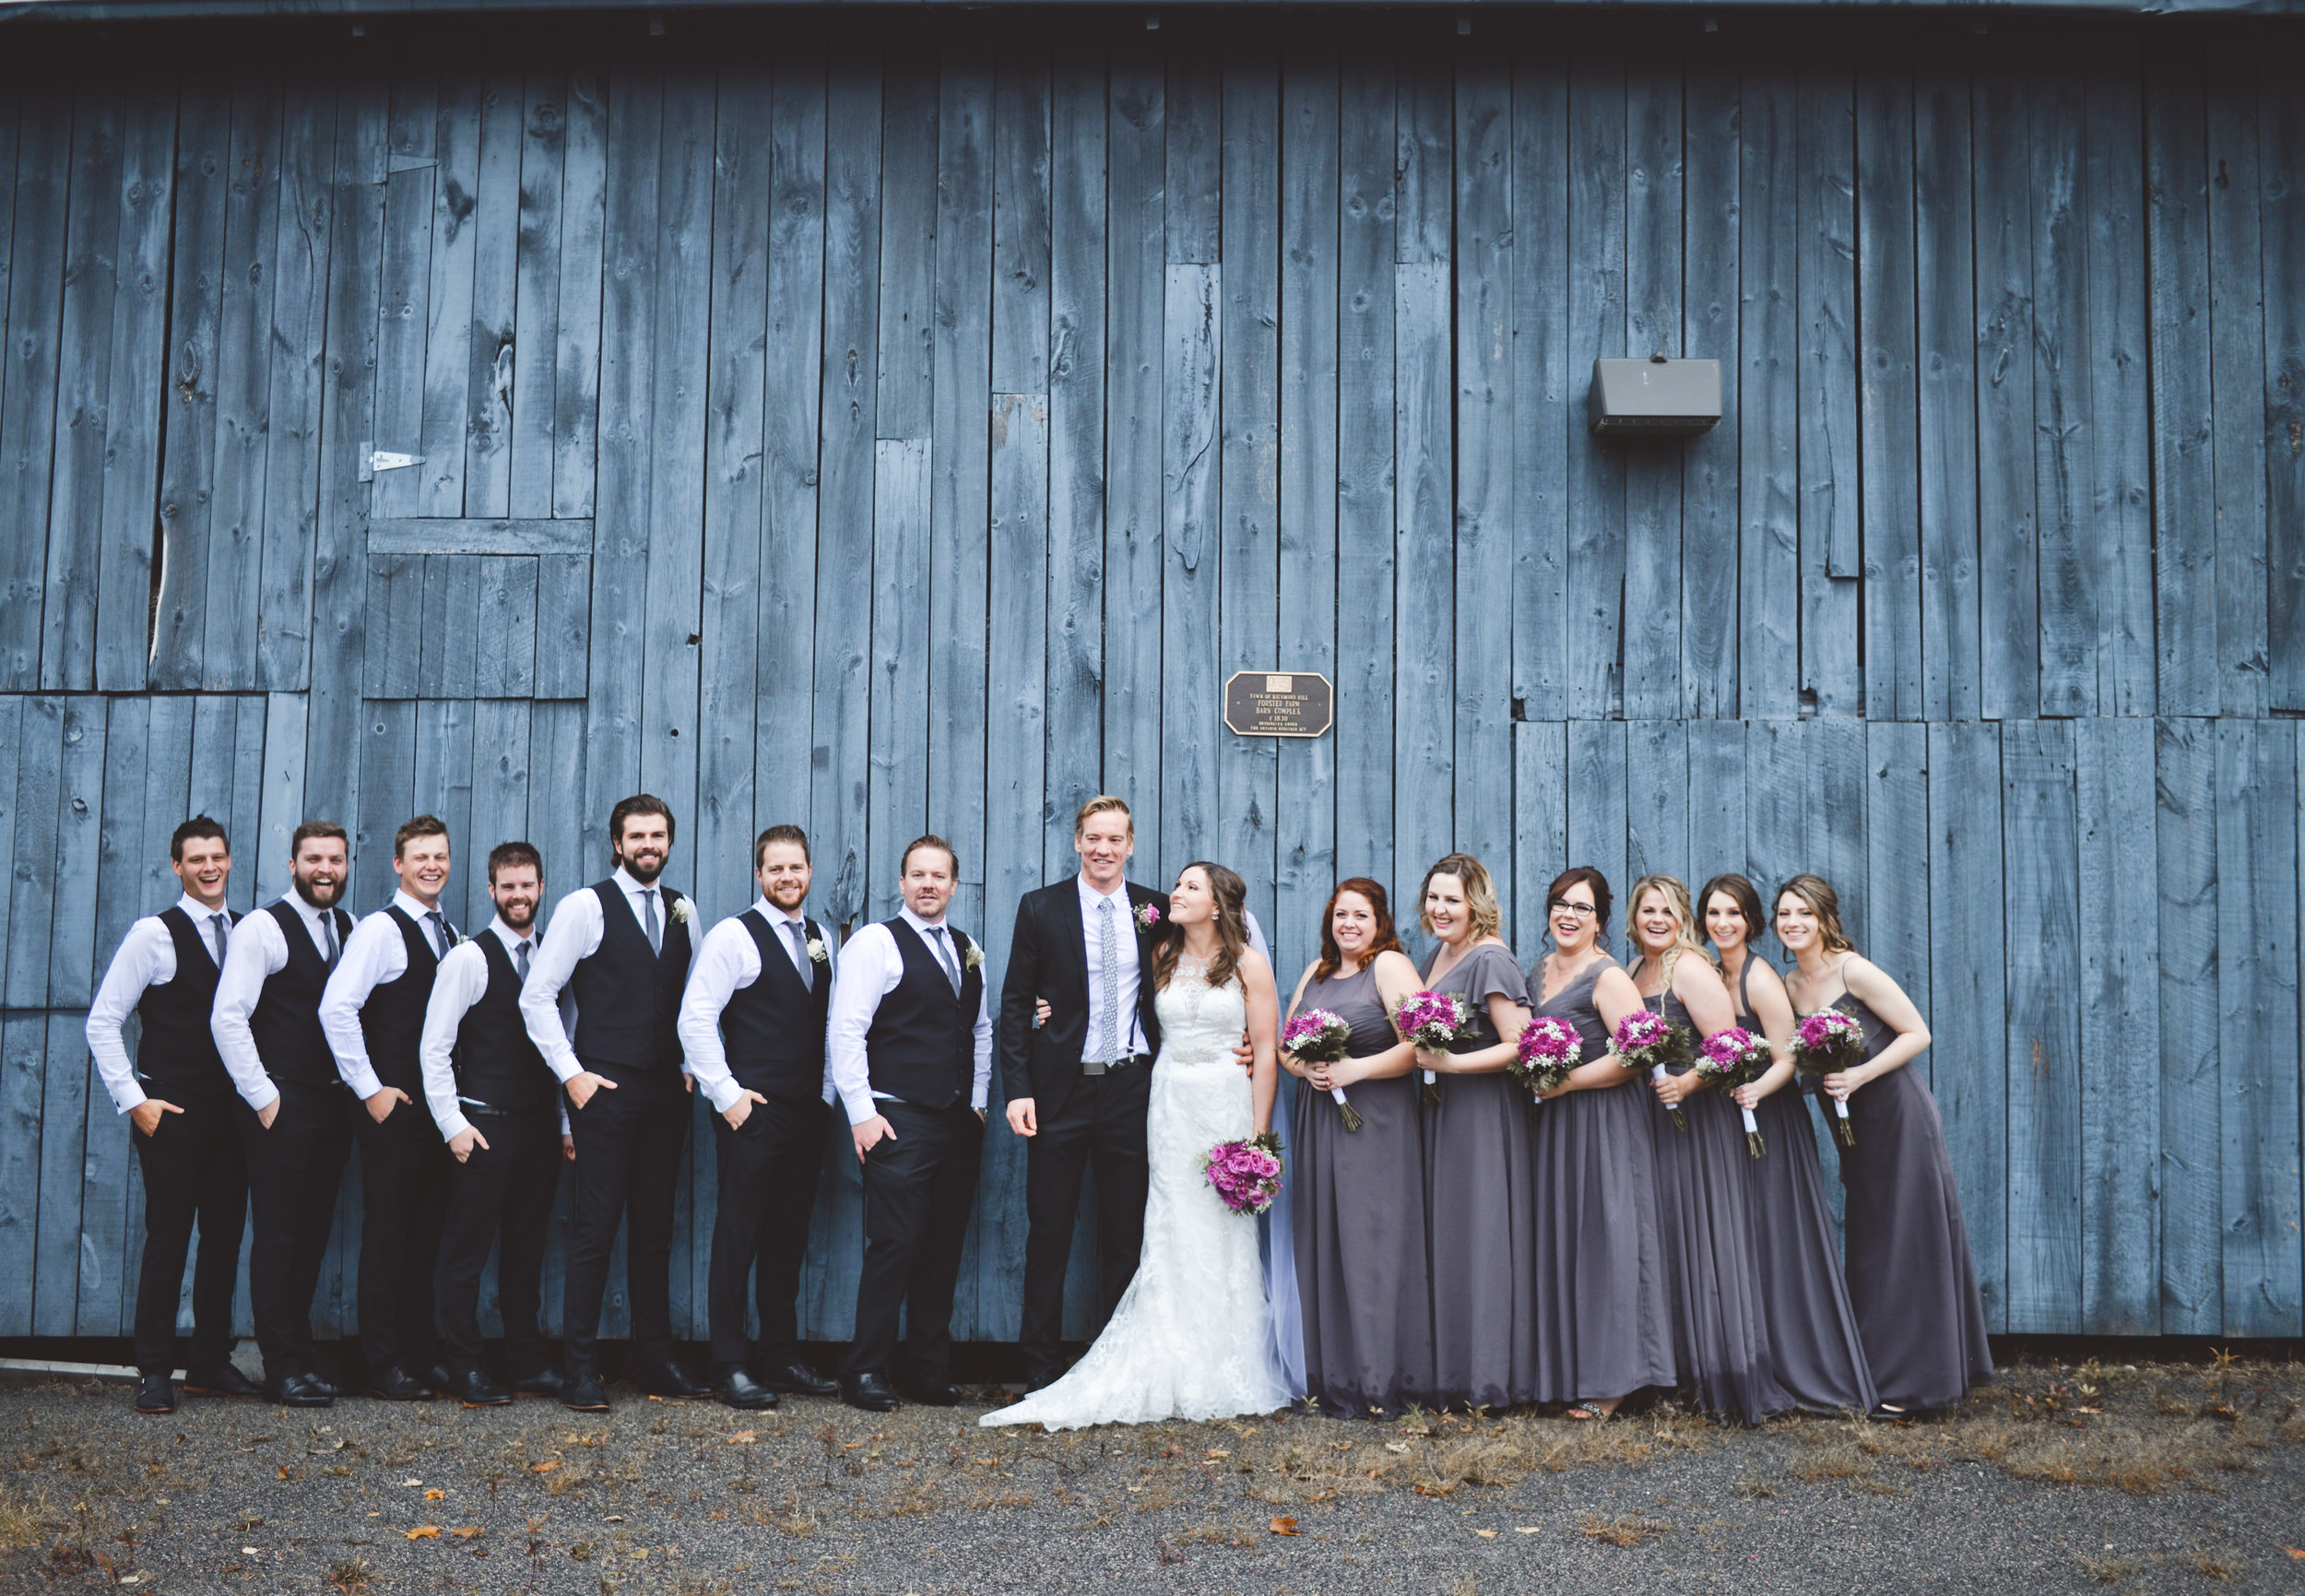 T+S - Wedding Party-2886.jpg